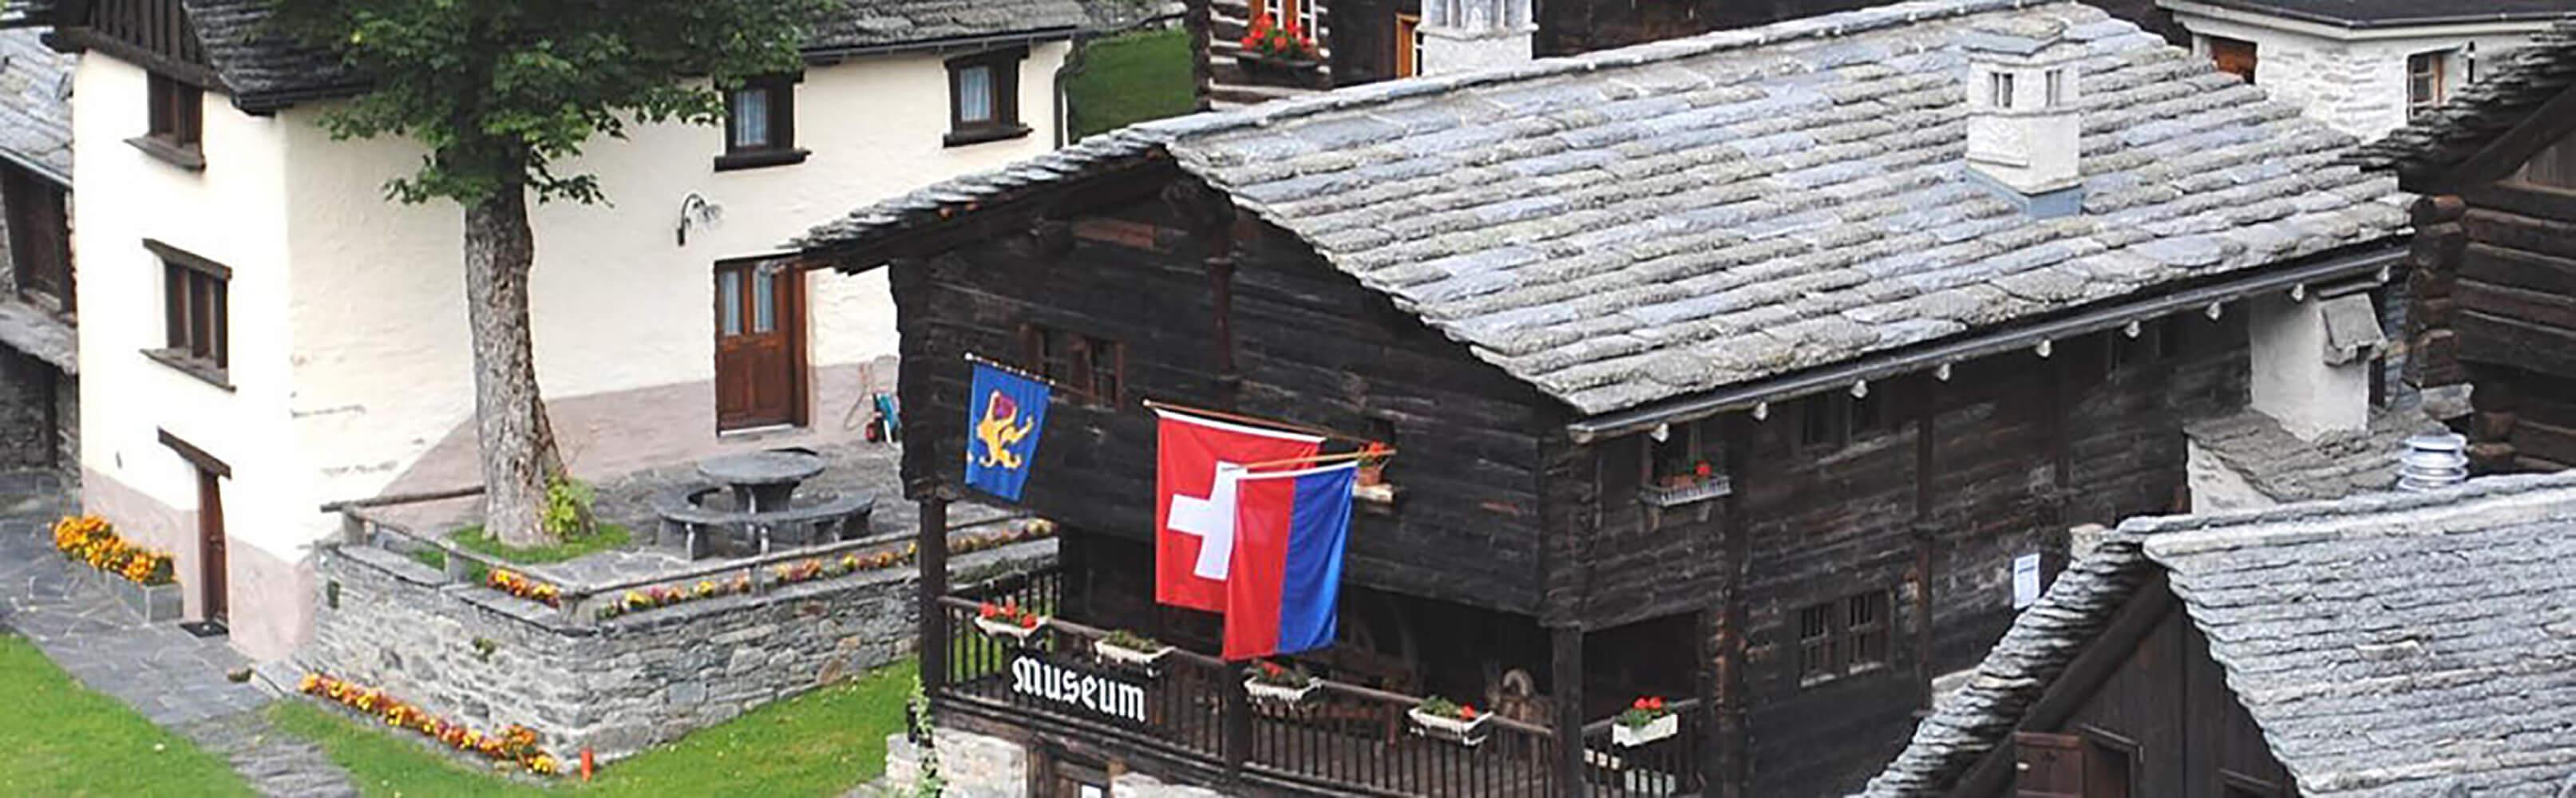 Walserhaus Bosco Gurin 1